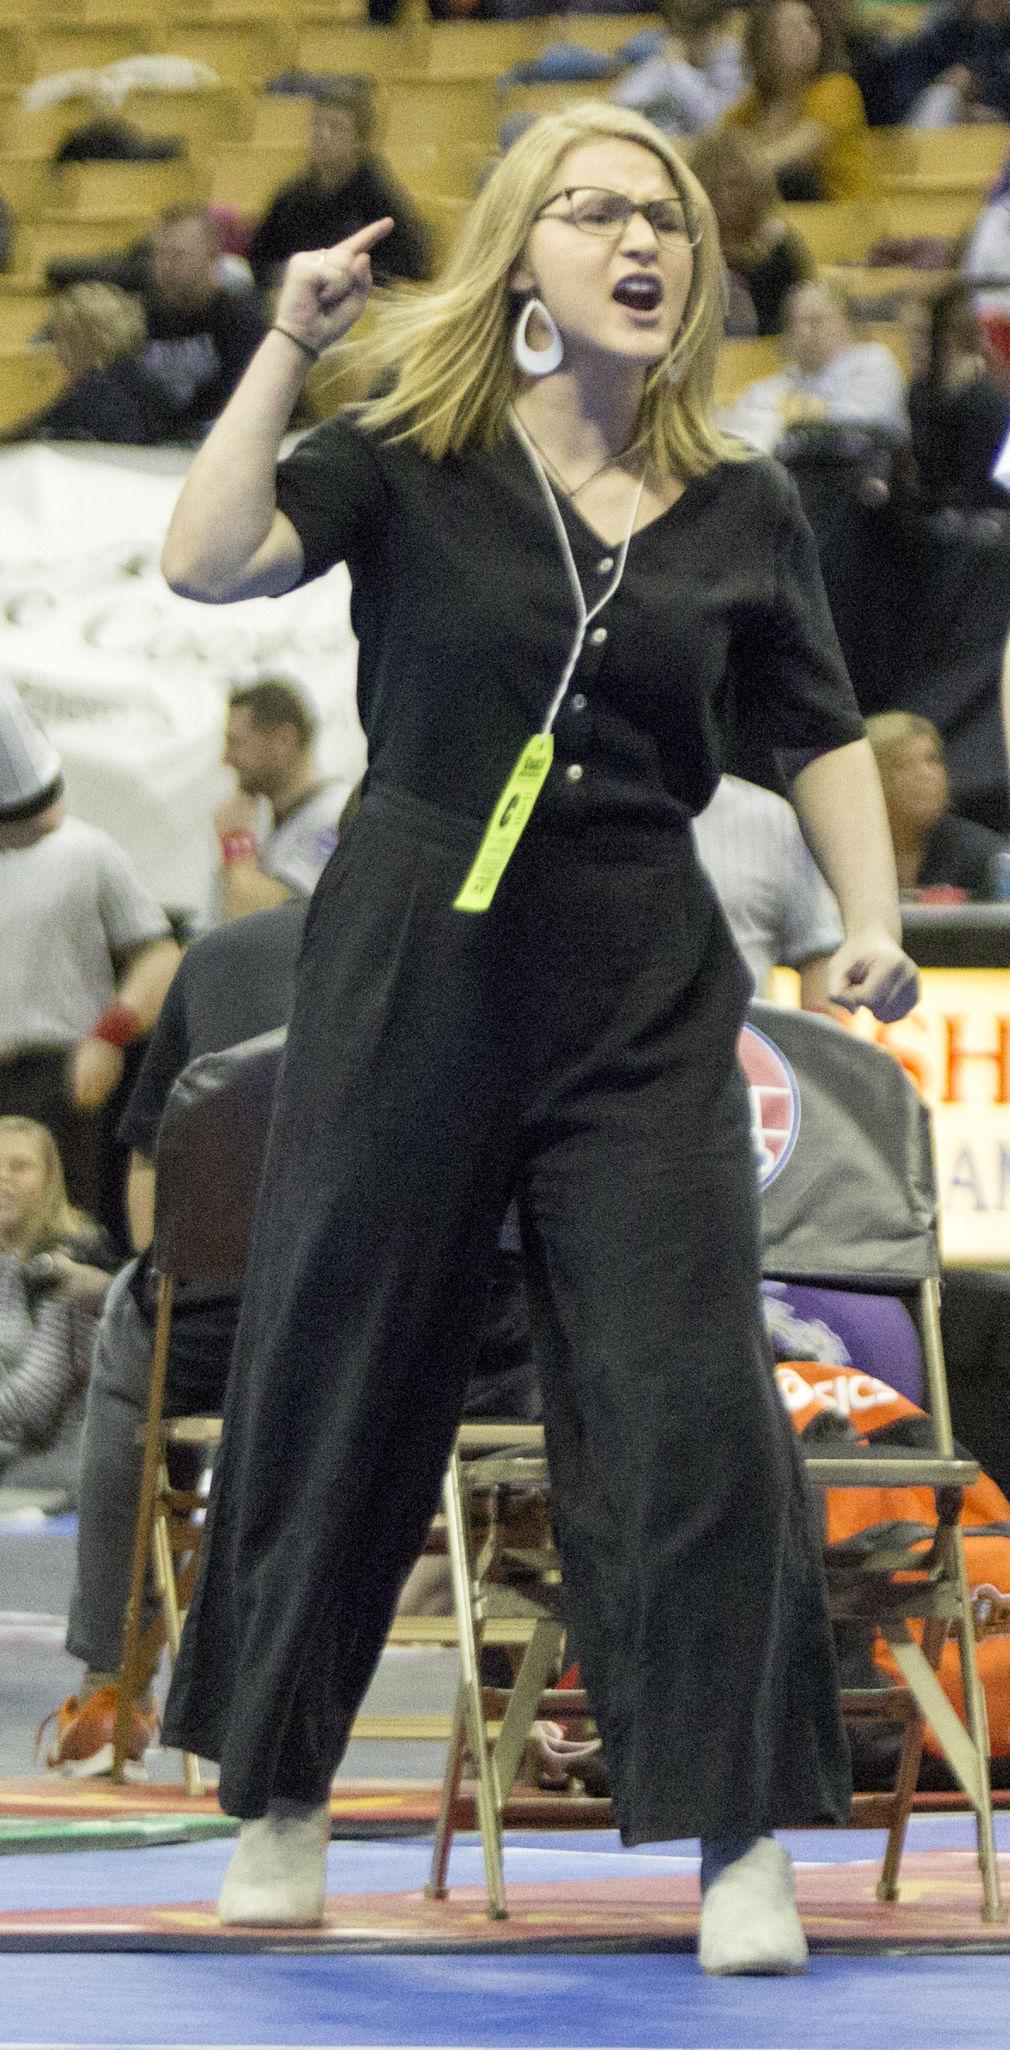 Beginning and an end: Samantha Erneste starts coaching